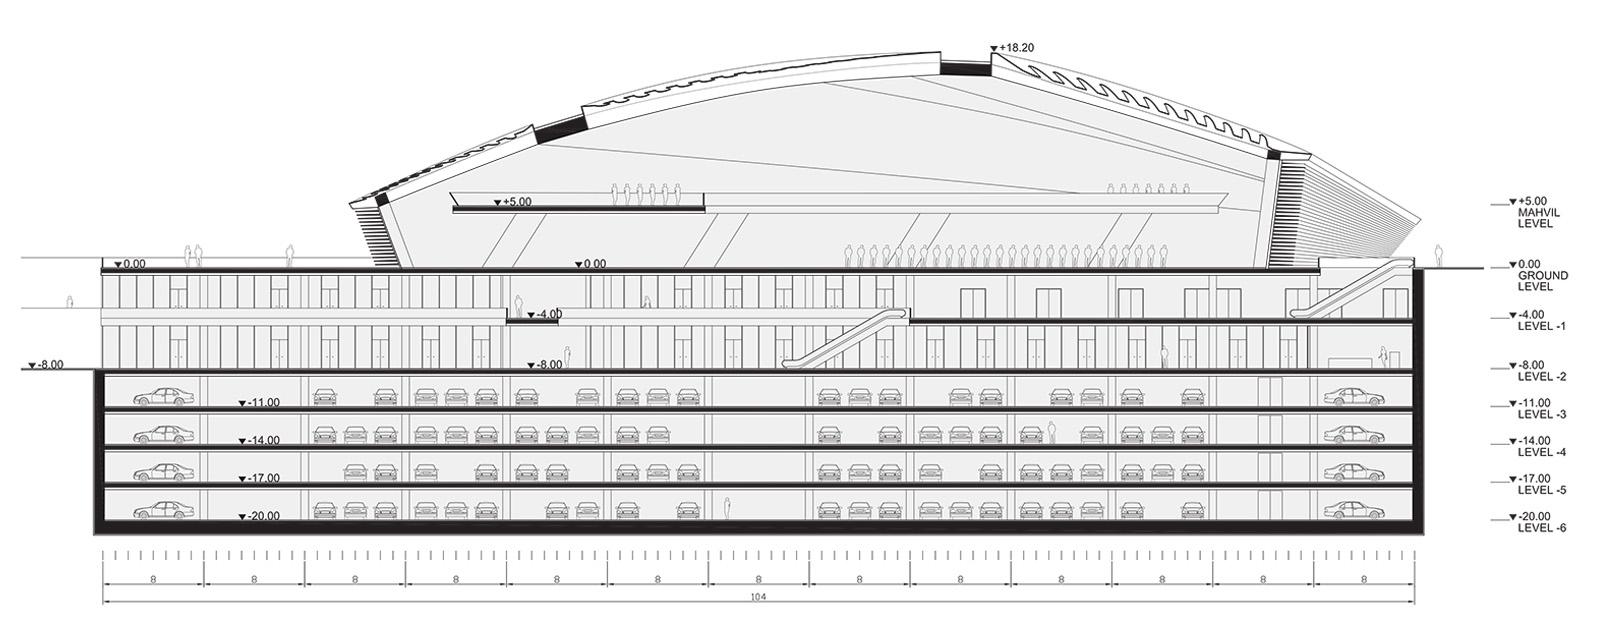 section_1.jpg